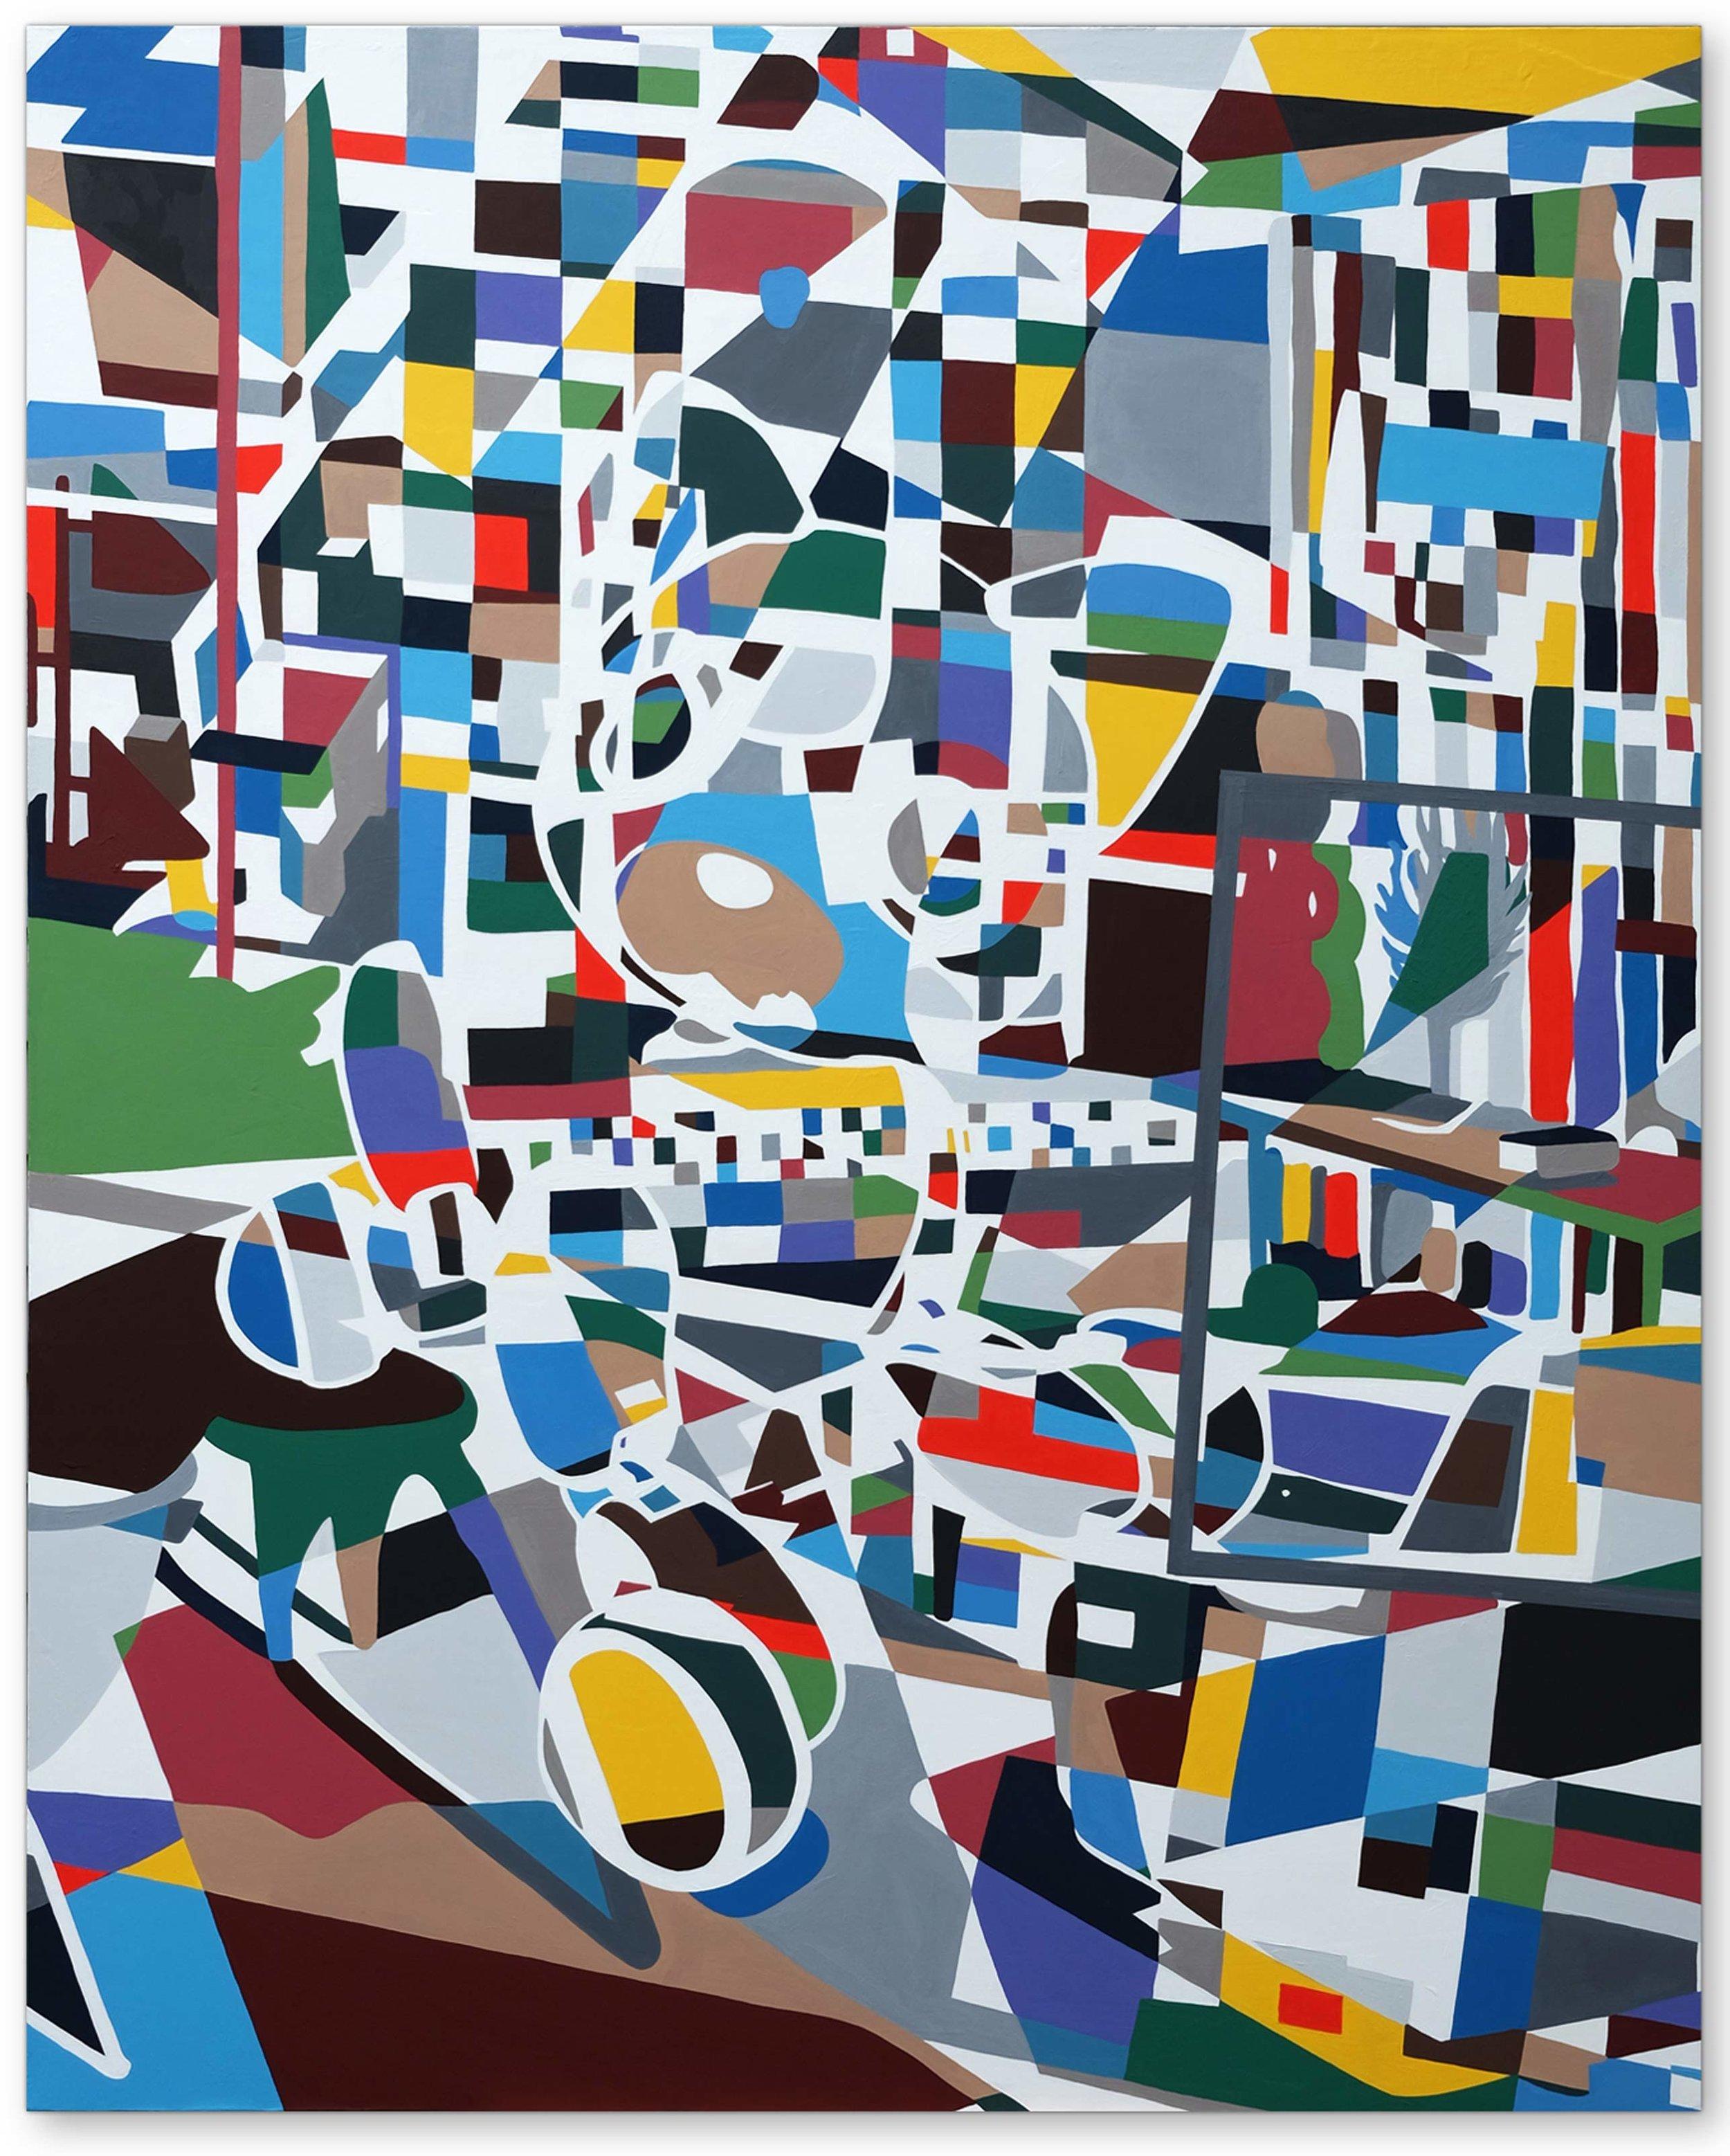 Imaginary Landscape No 16,  2016 | Acrylic on canvas, 1524 x 1220mm